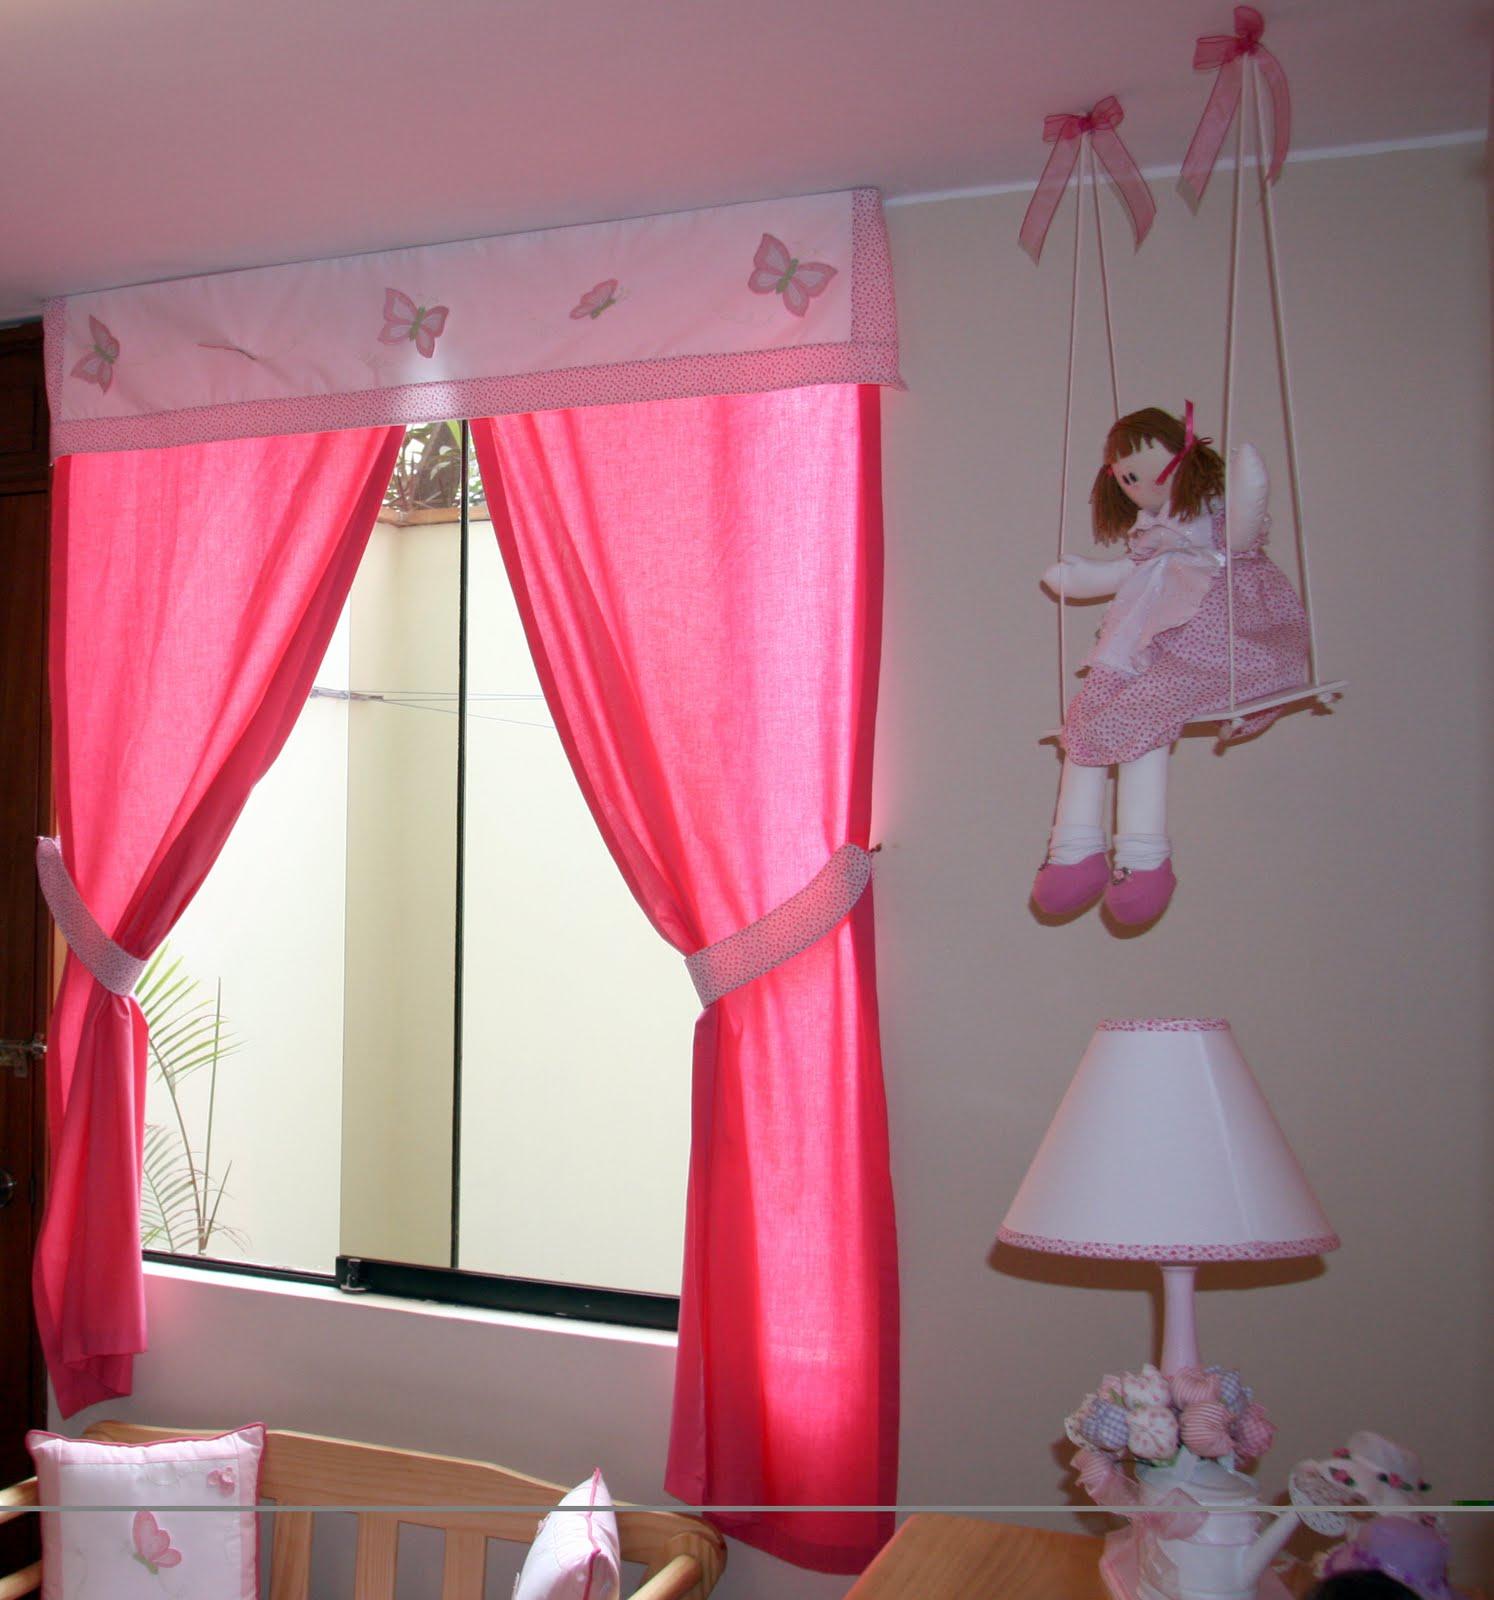 Cortinas Para Bebes Nia Ideas Para Decorar Para Bebe Nia With - Cortinas-dormitorio-nia